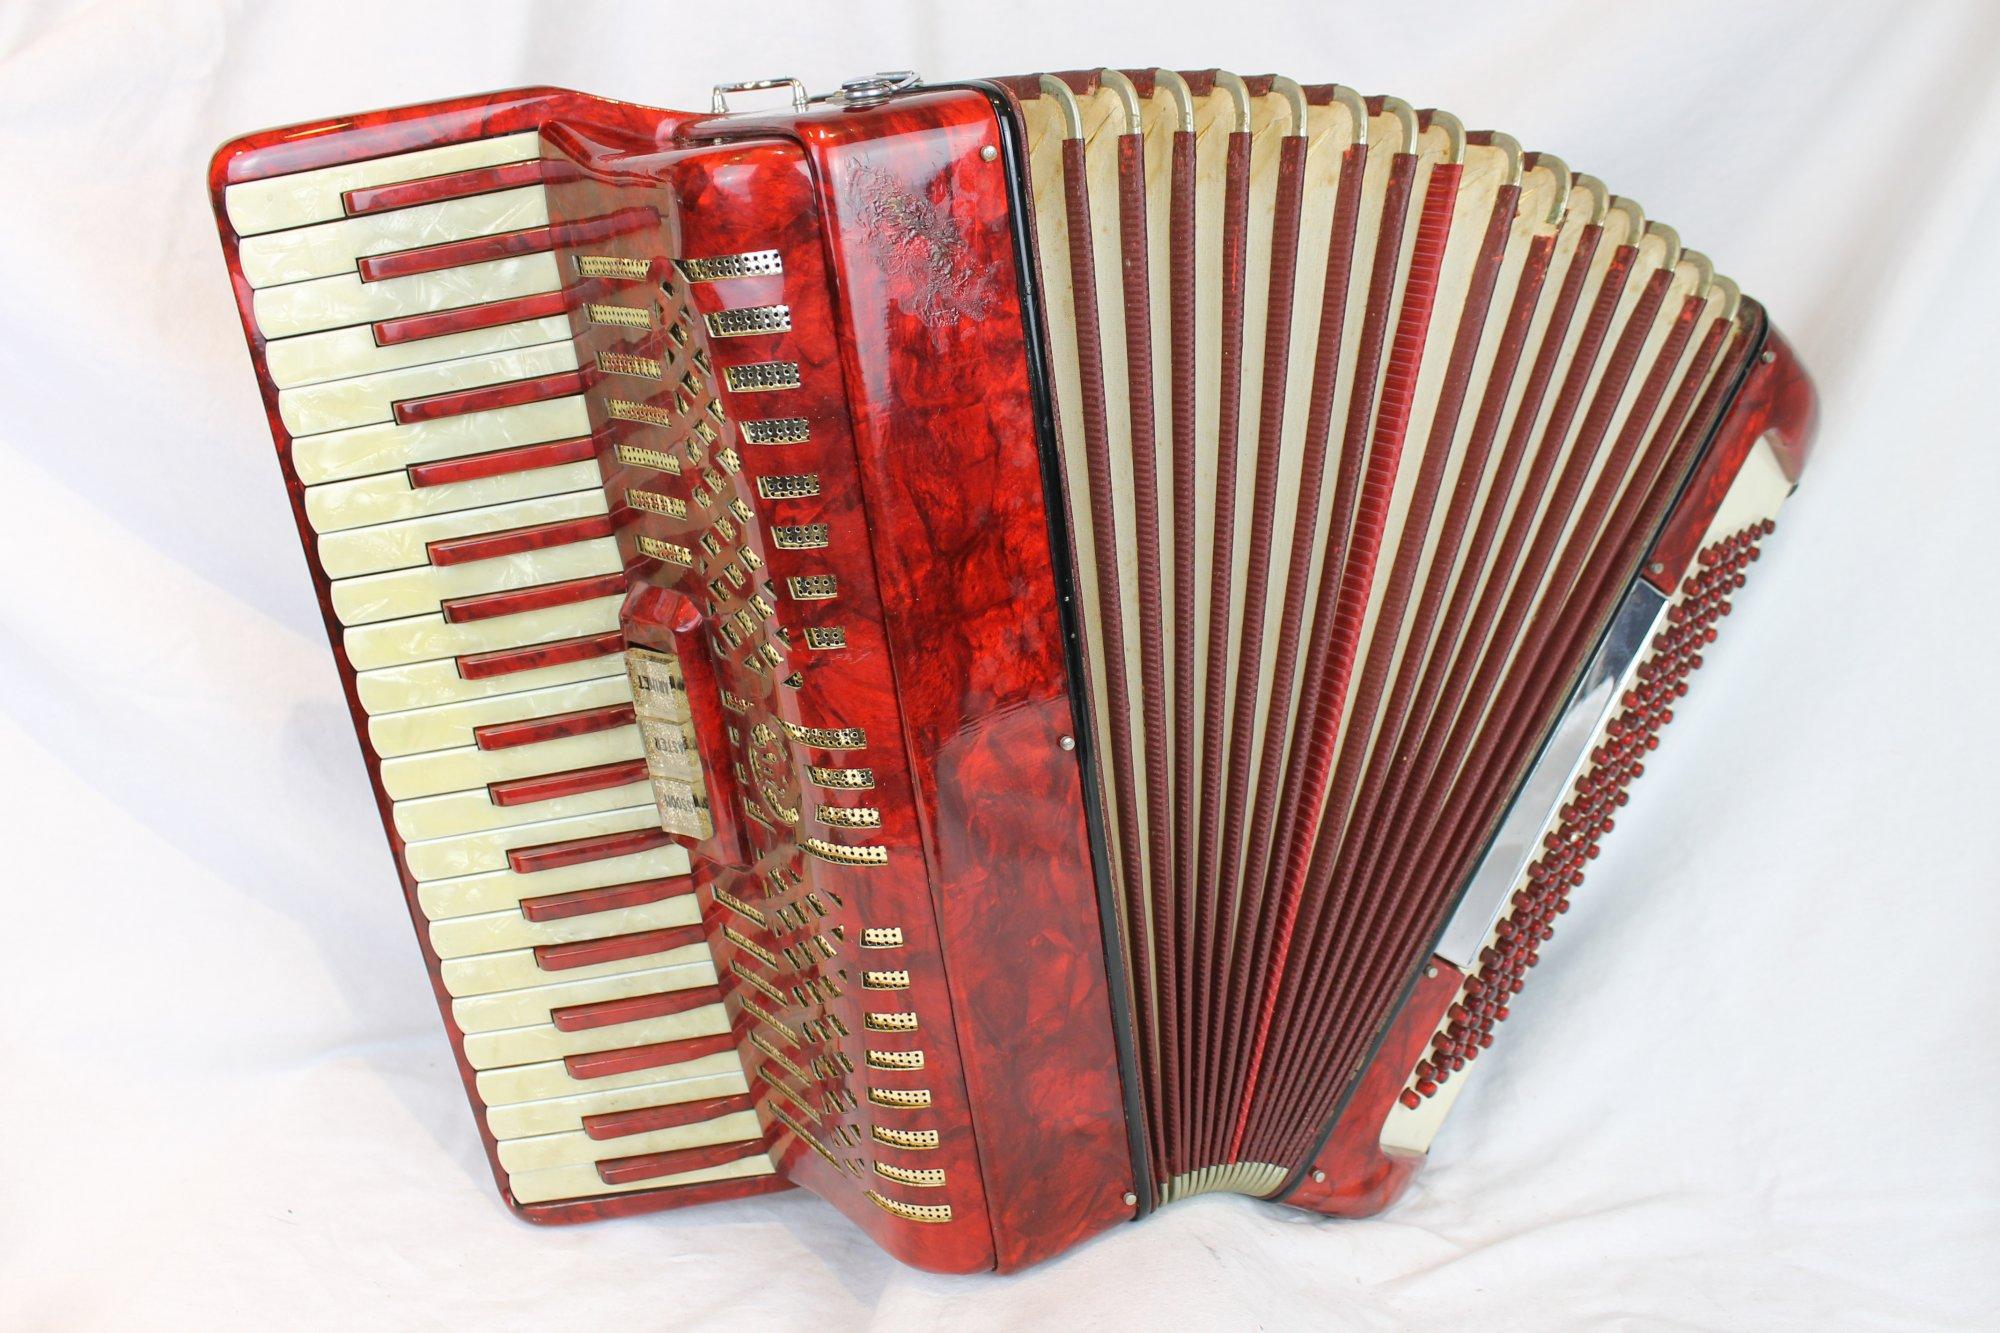 6097 - Red Italian Piano Accordion LM 41 120